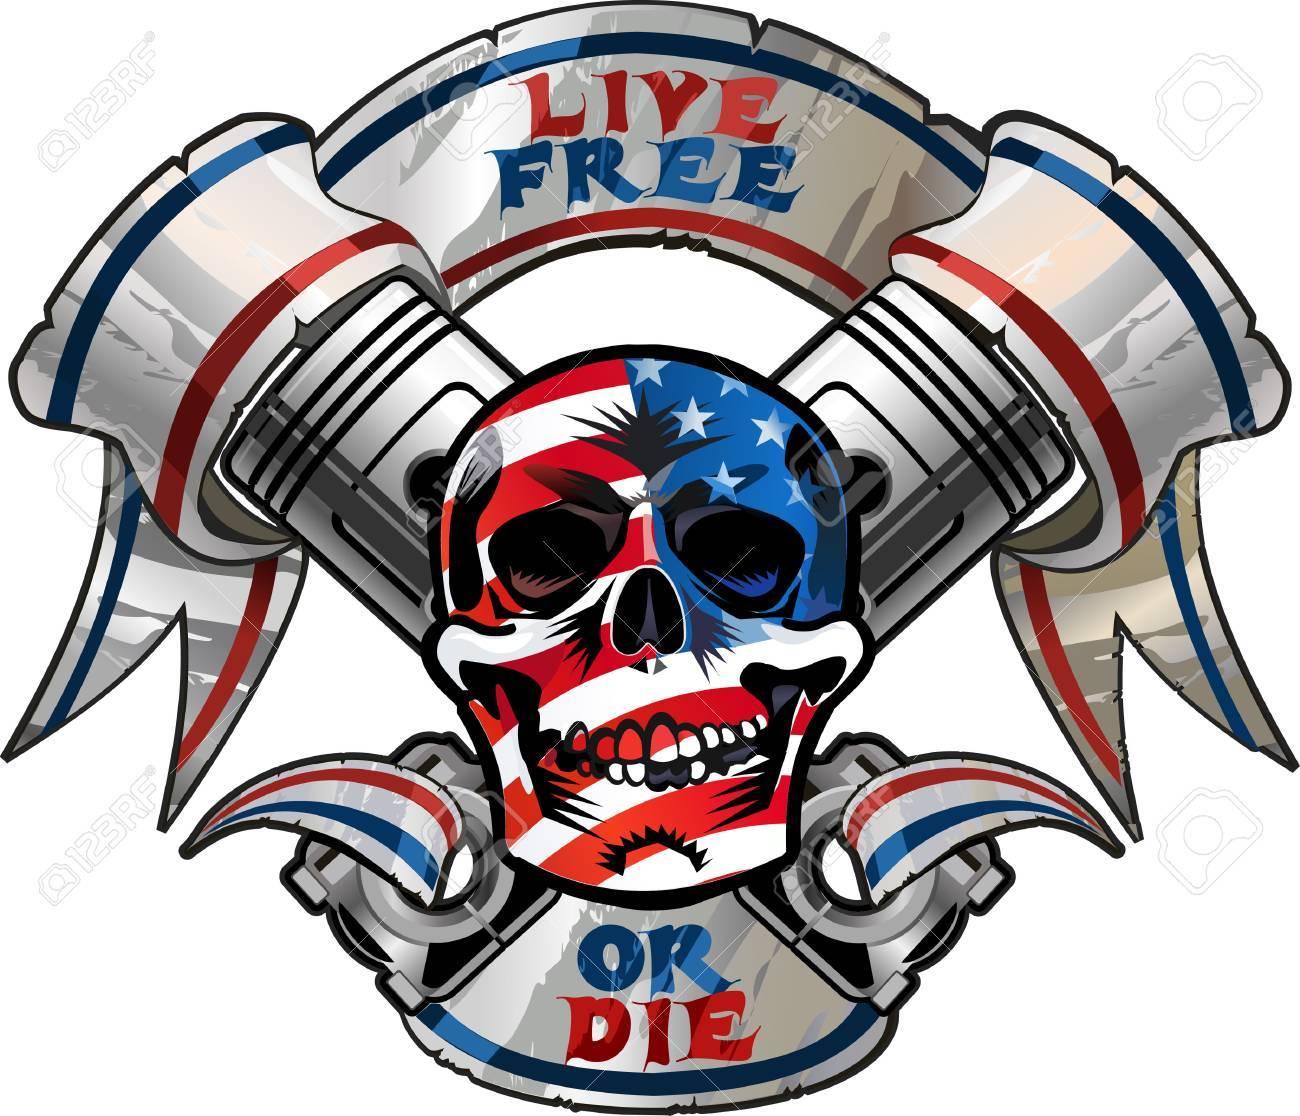 Live Free or Die / Biker Skull design - 50013764